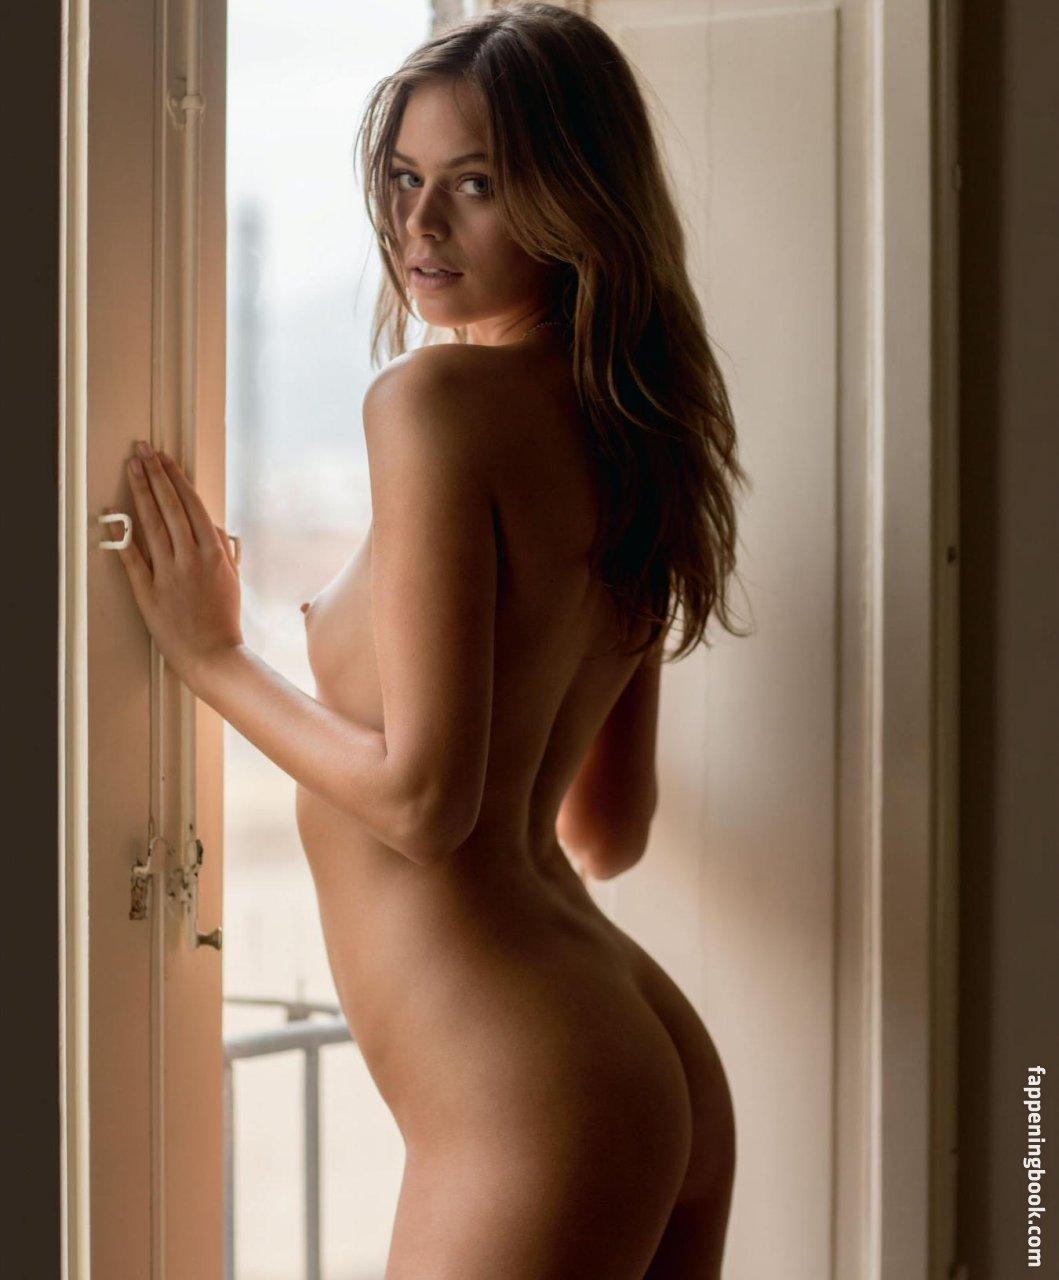 Roxanna june nude